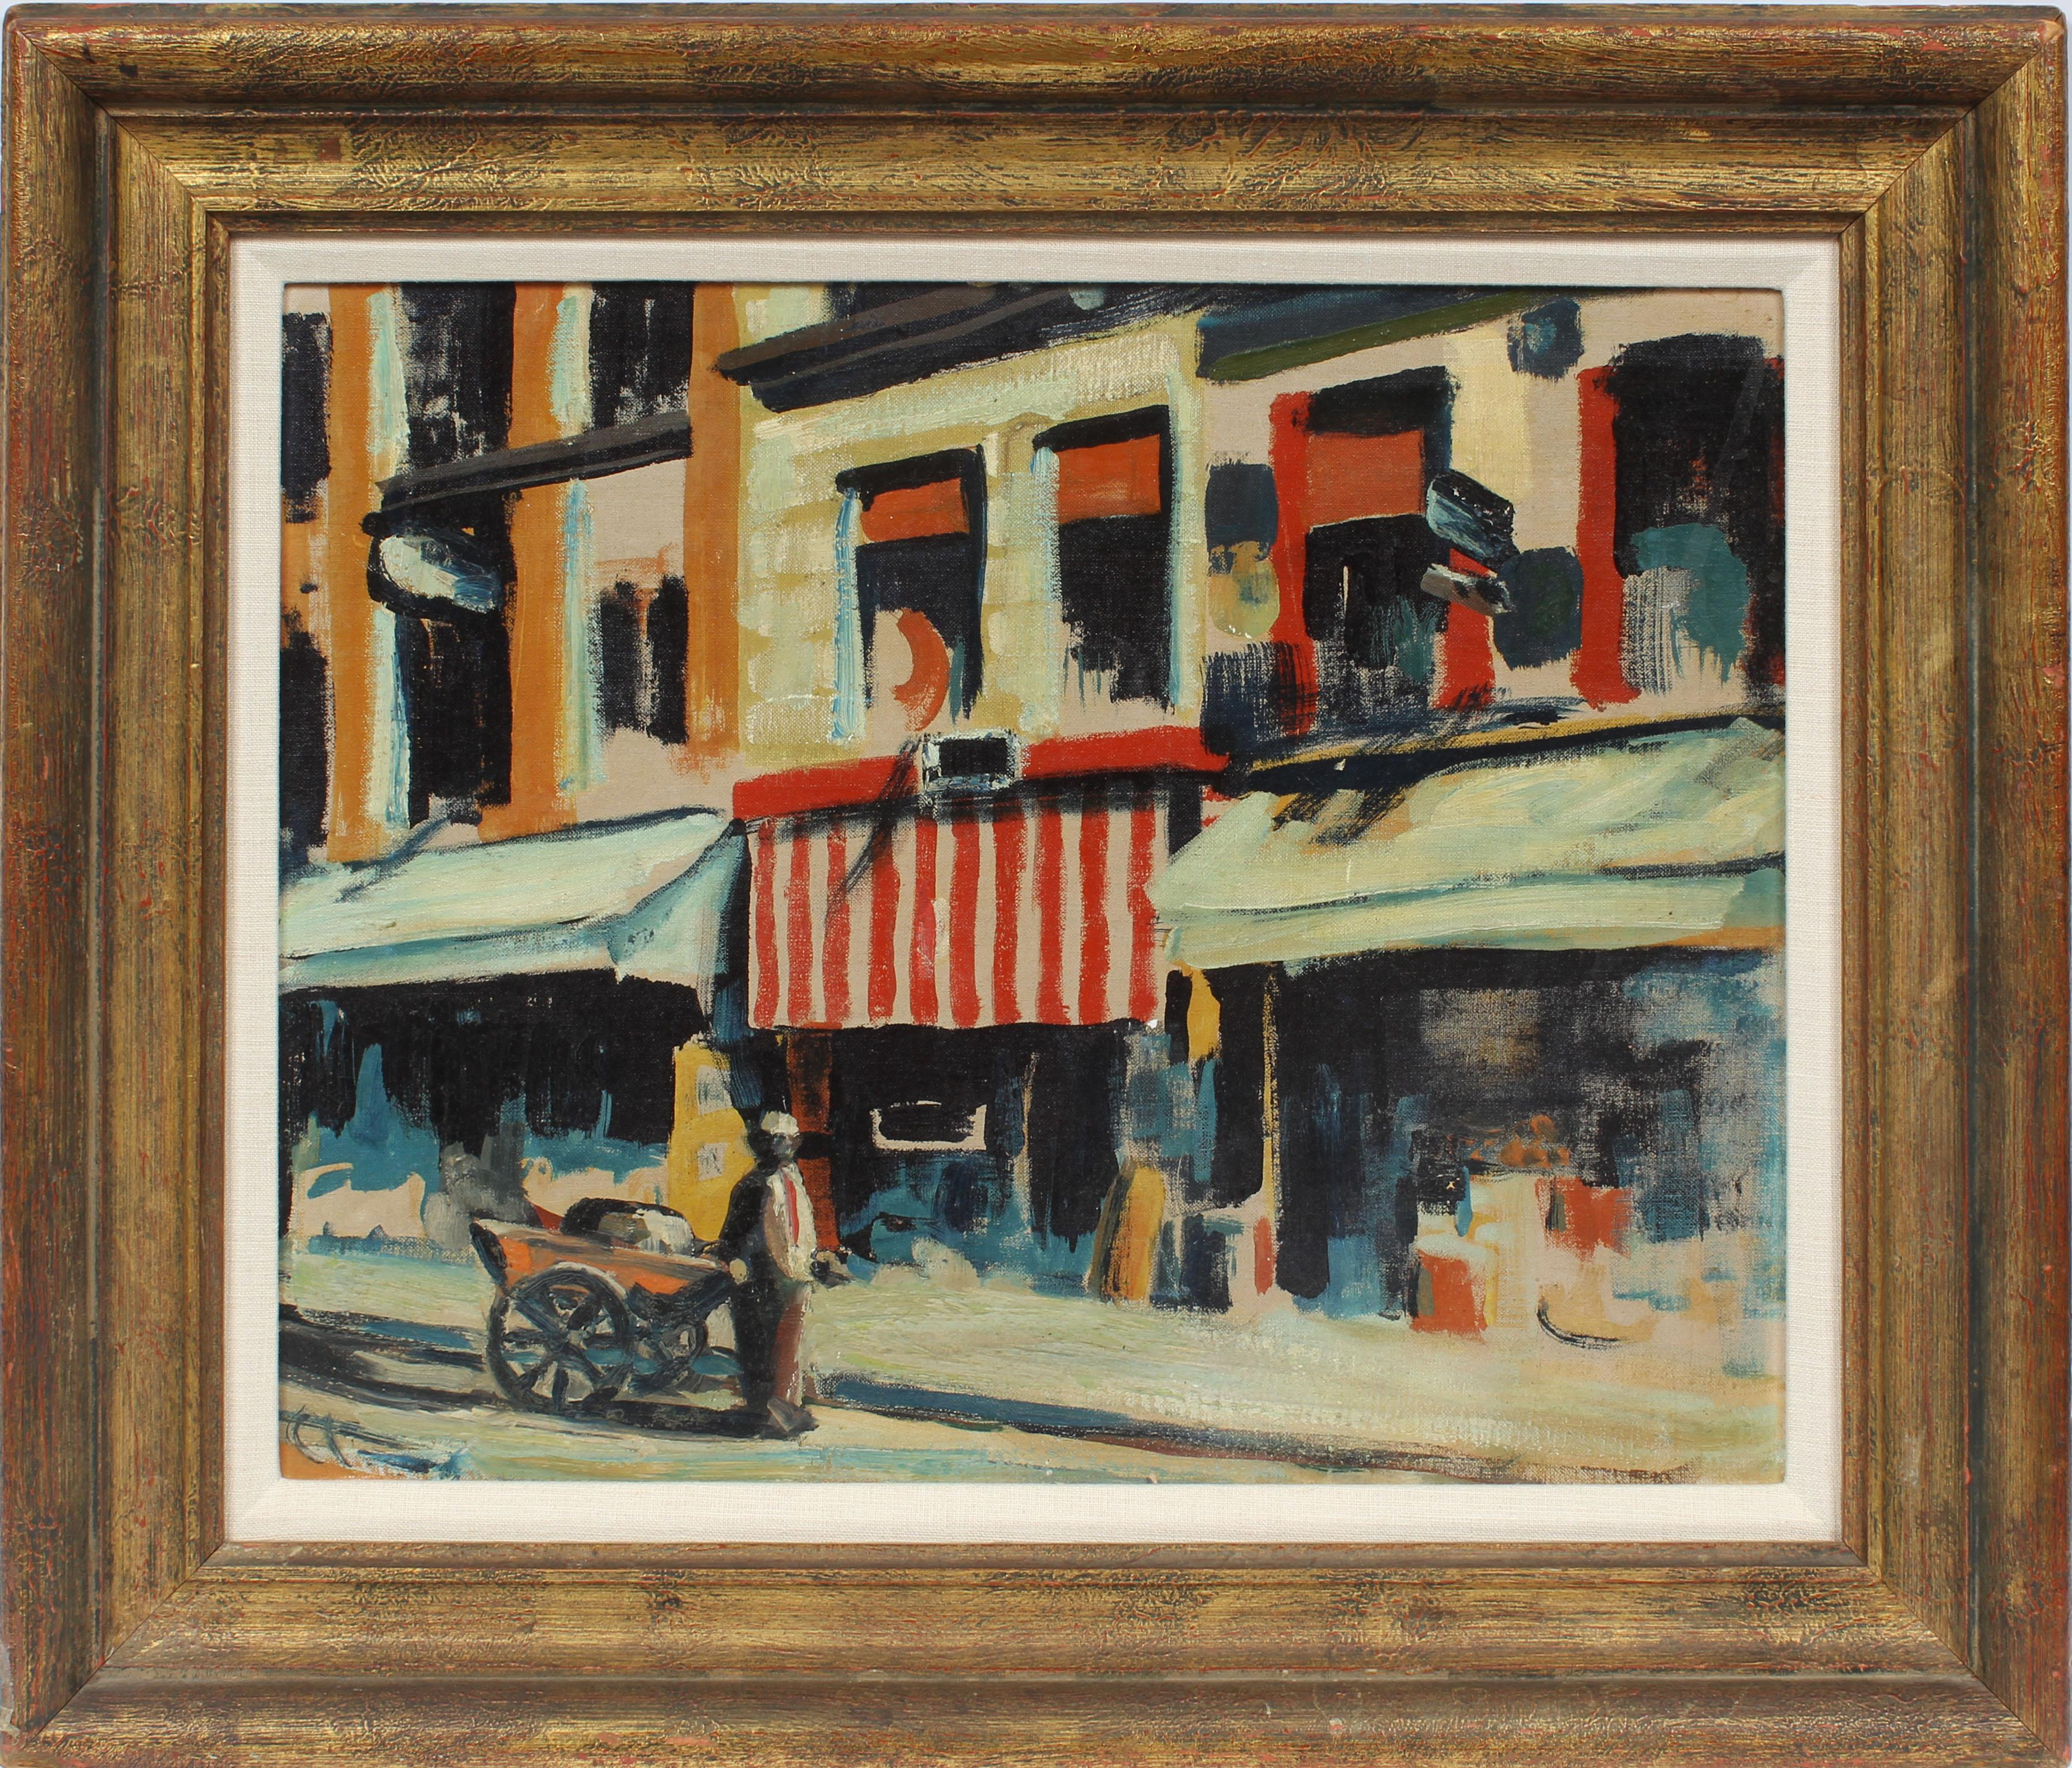 Antique Modernist New York City Downtown Street Scene Original WPA Oil Painting